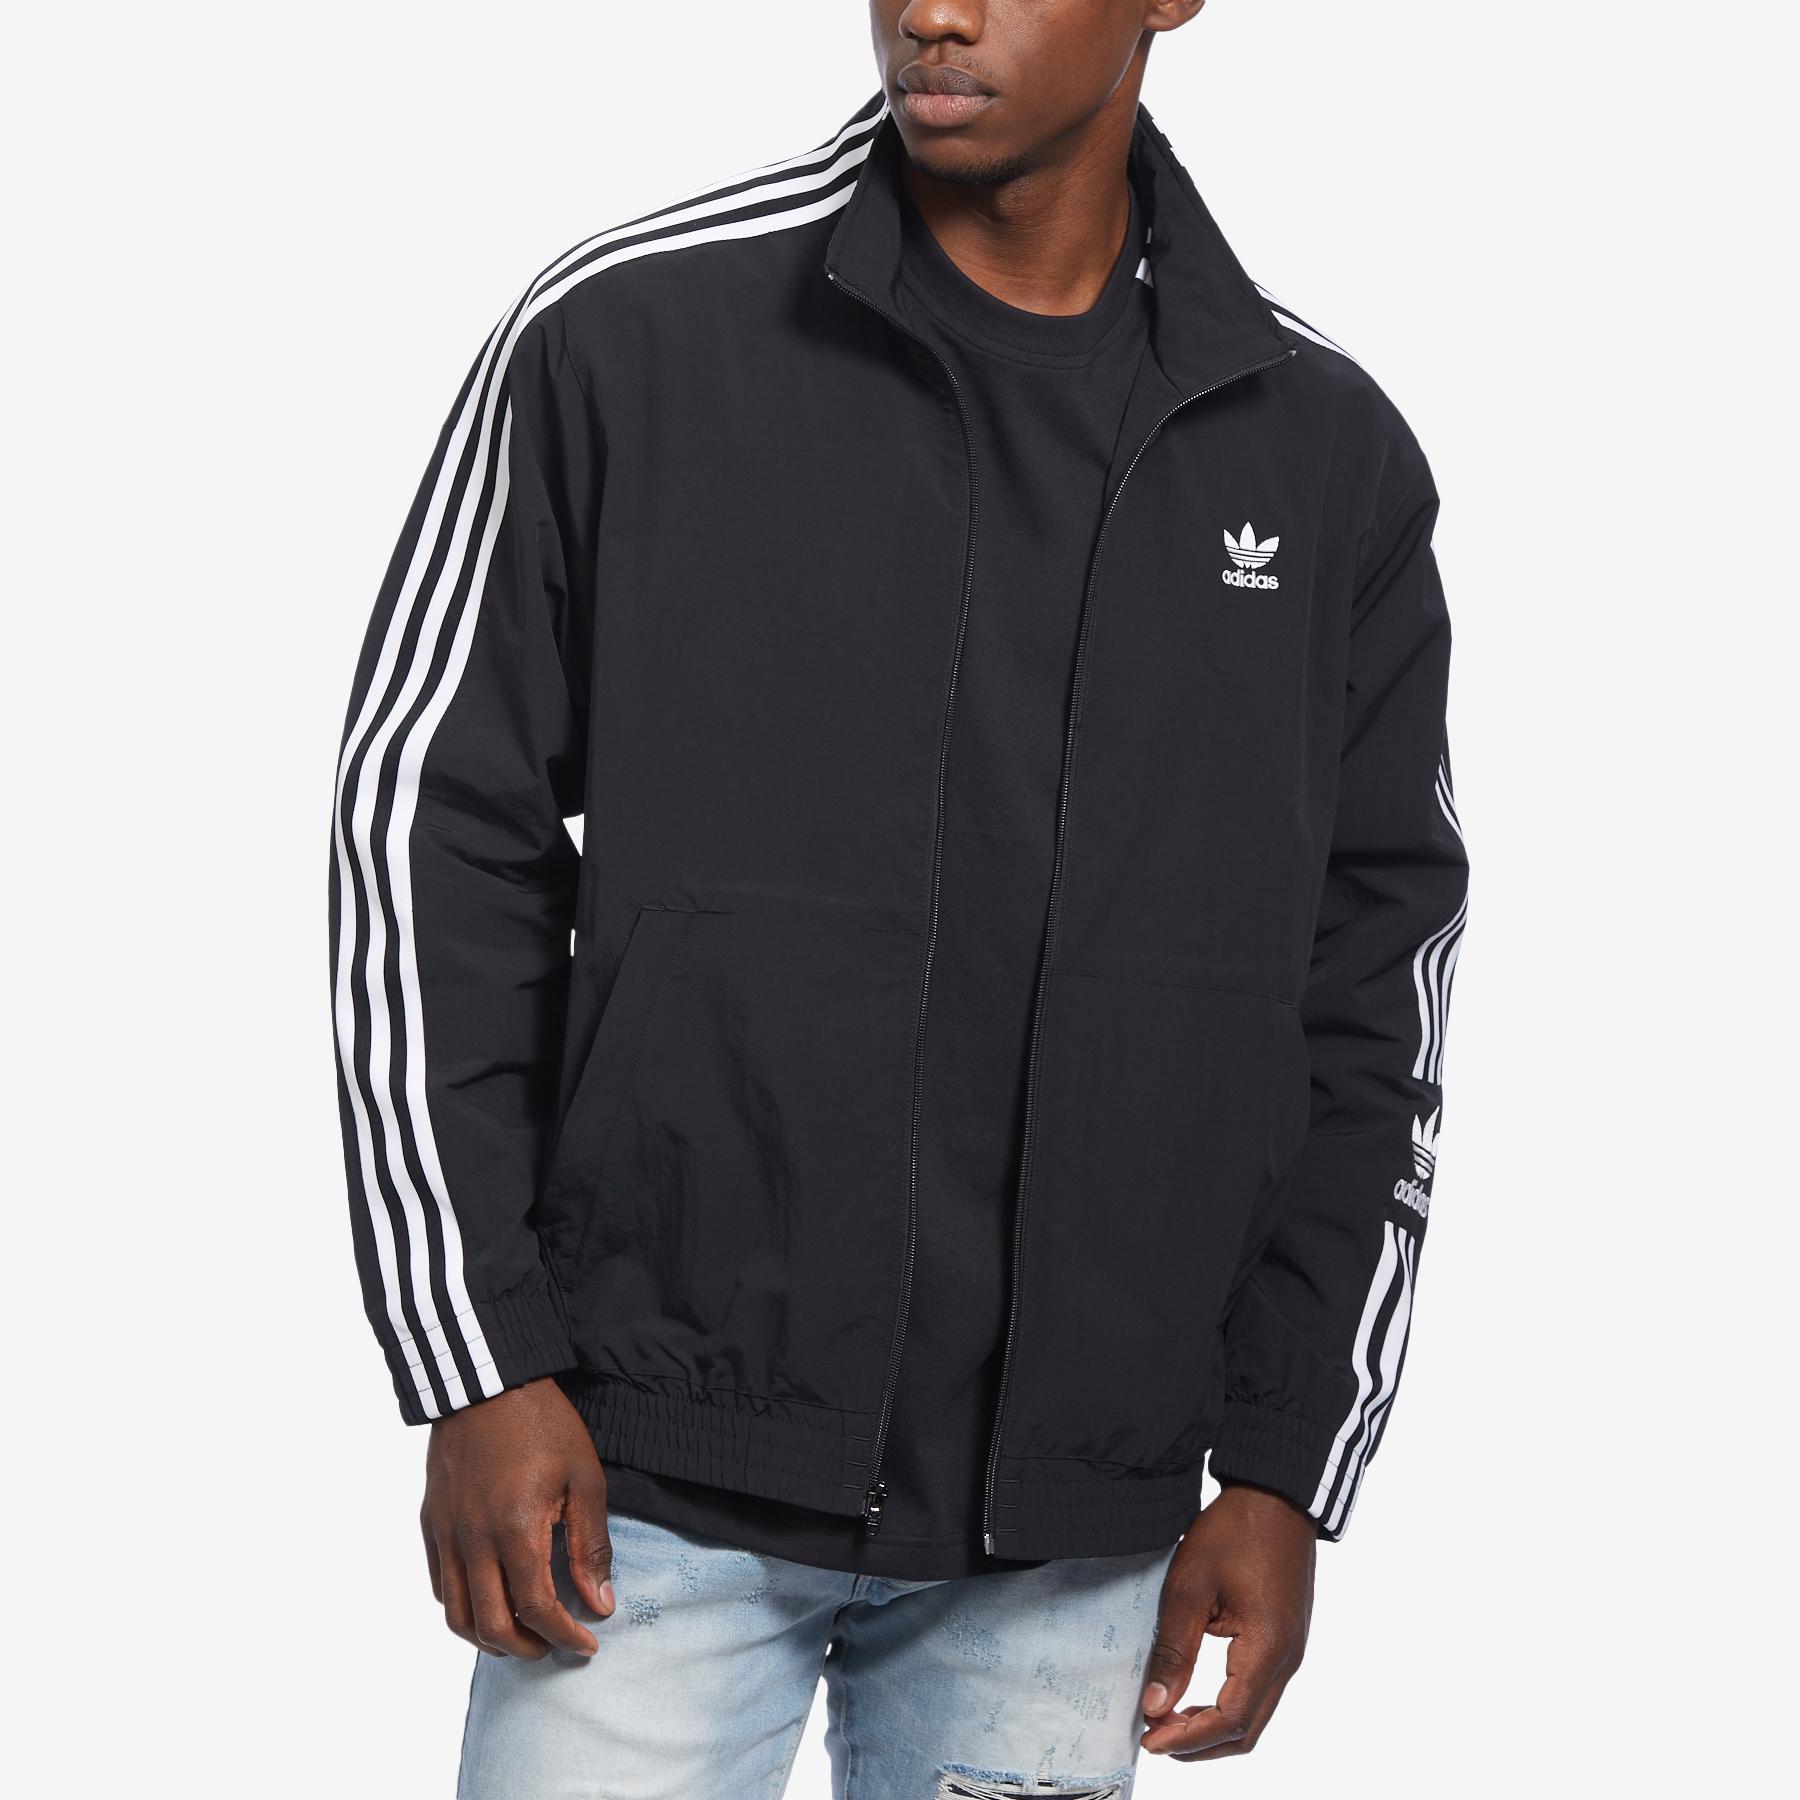 Men's Woven Track Jacket